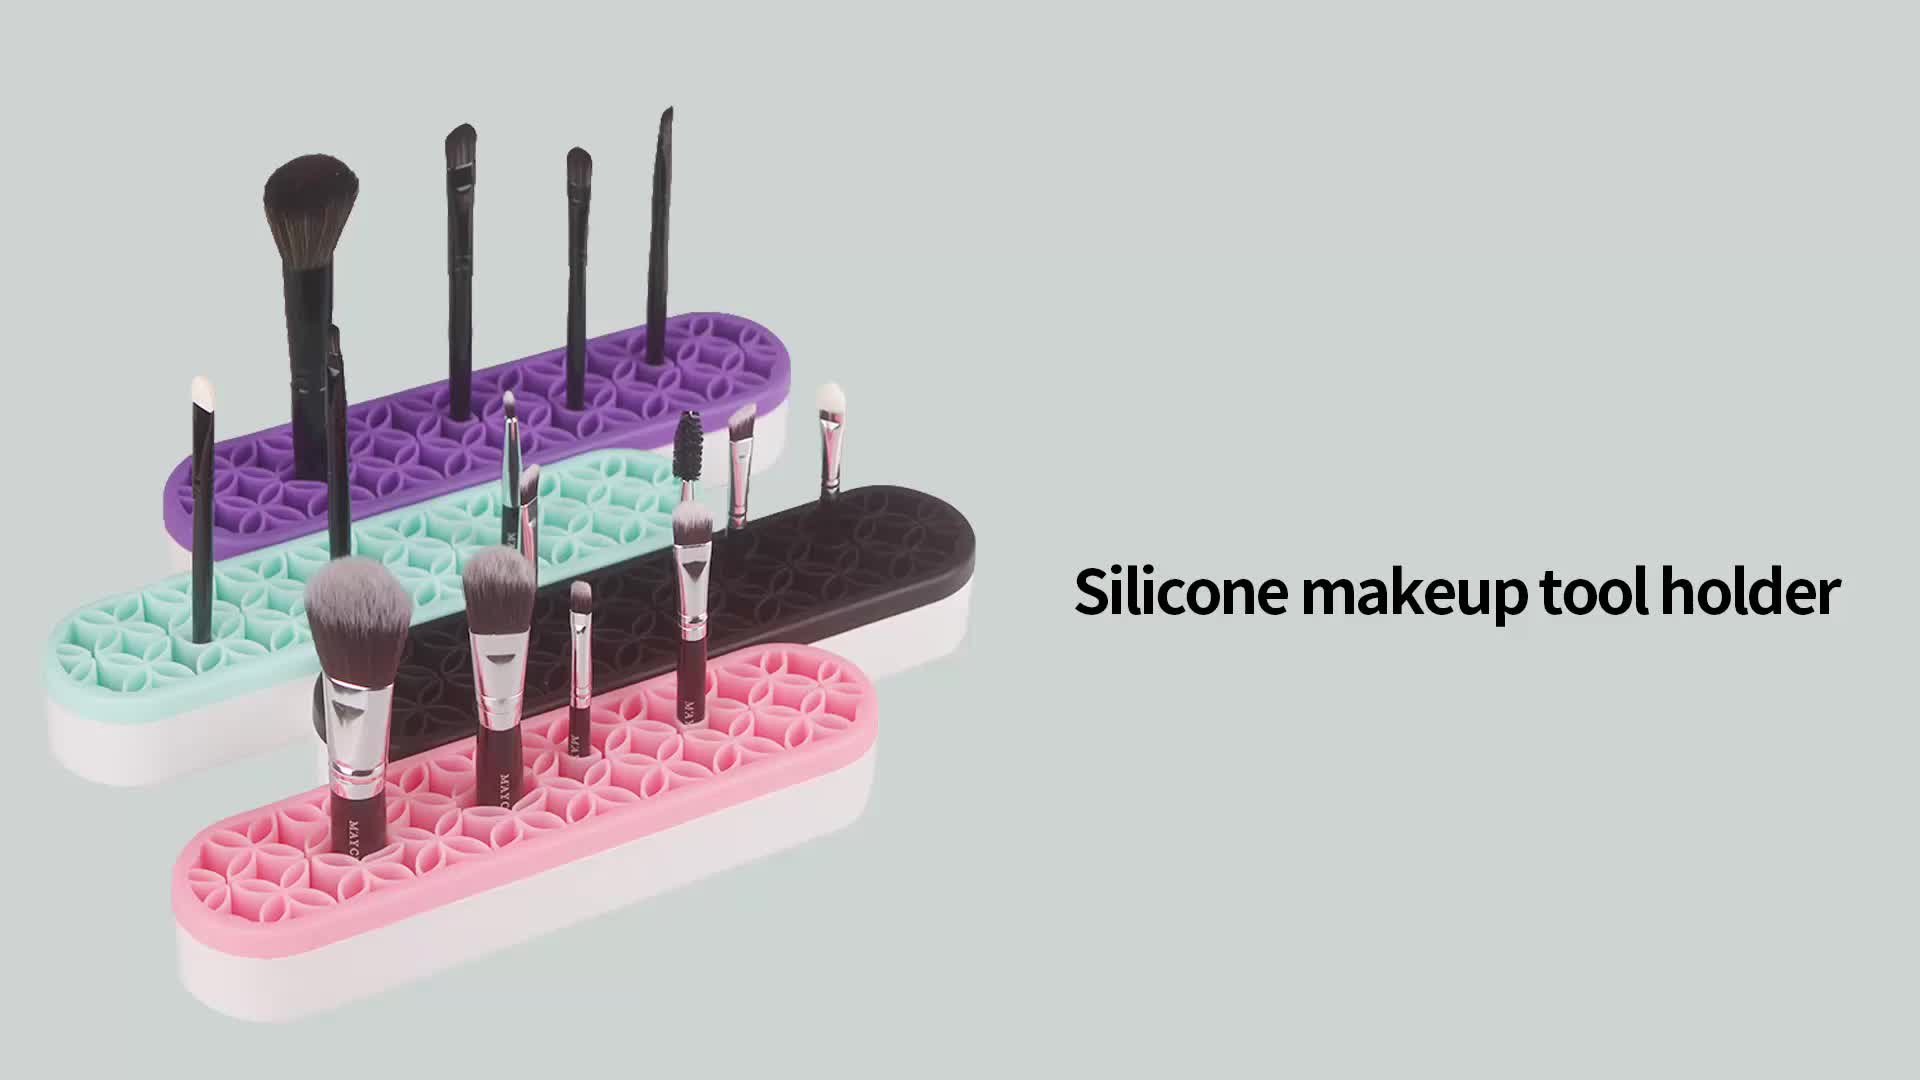 ECO-Friendly Wholesale Silicone Makeup Brush Holder